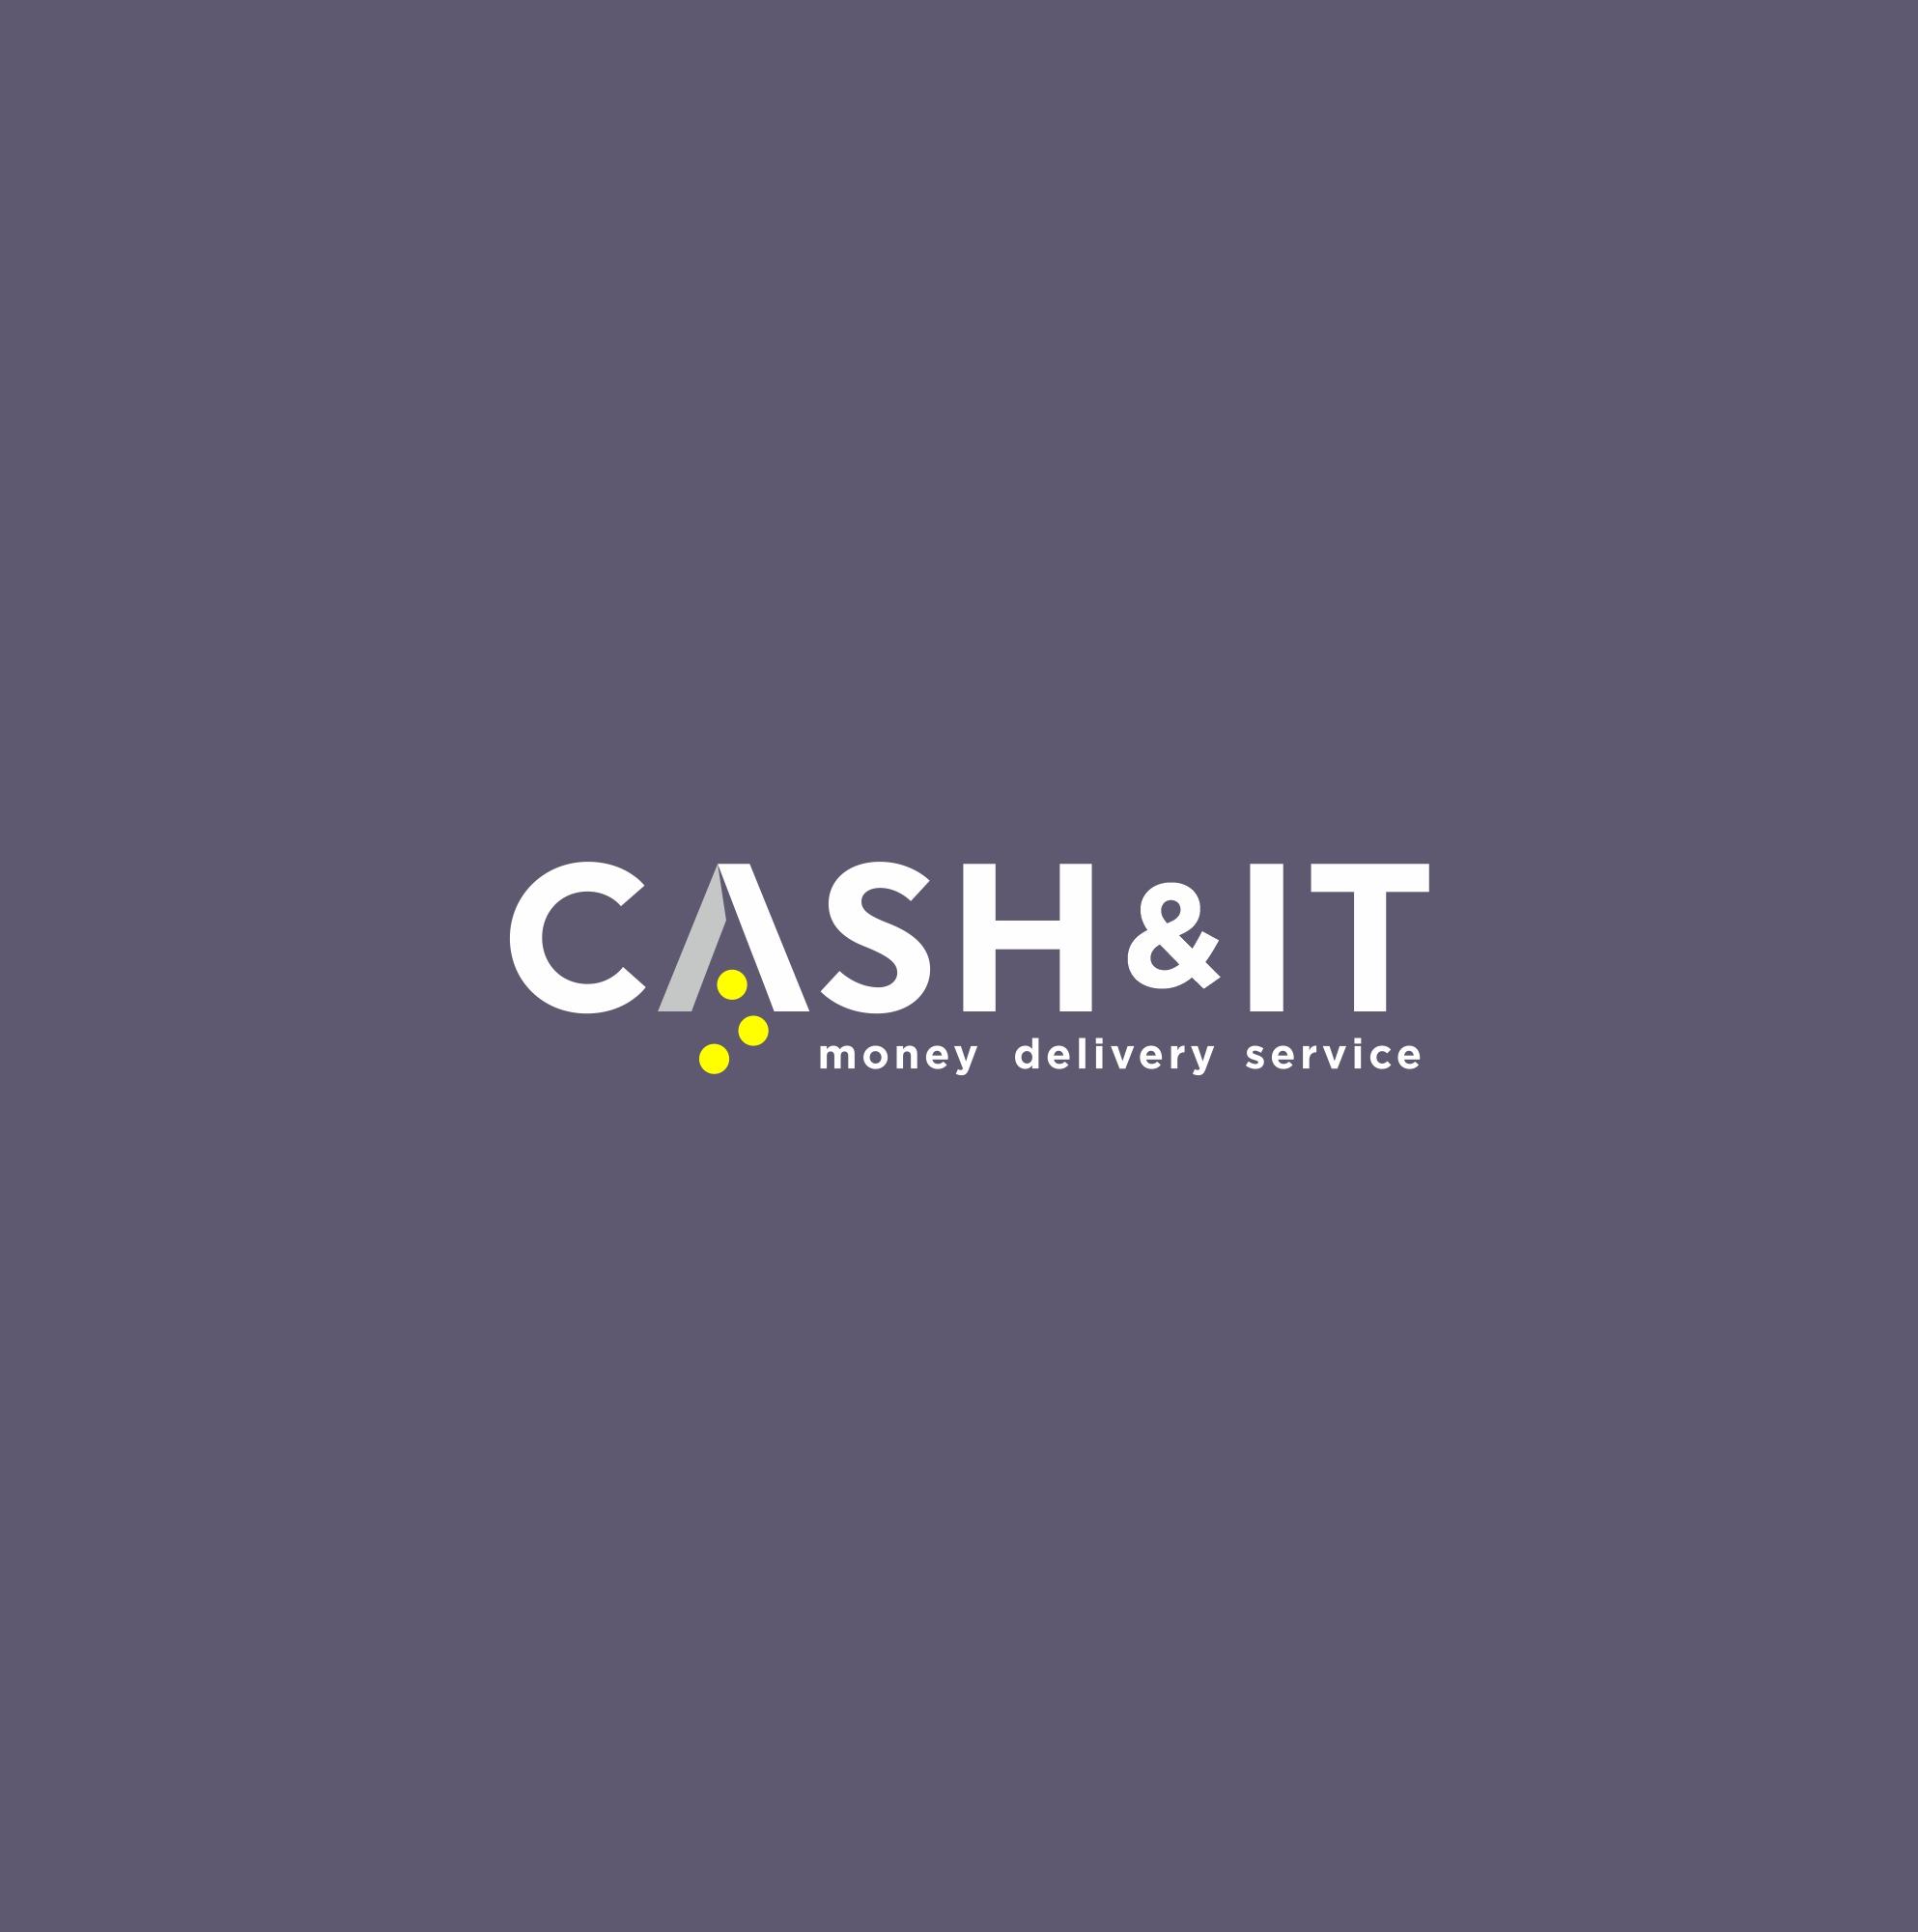 Логотип для Cash & IT - сервис доставки денег фото f_4595fdf51e9e8703.jpg